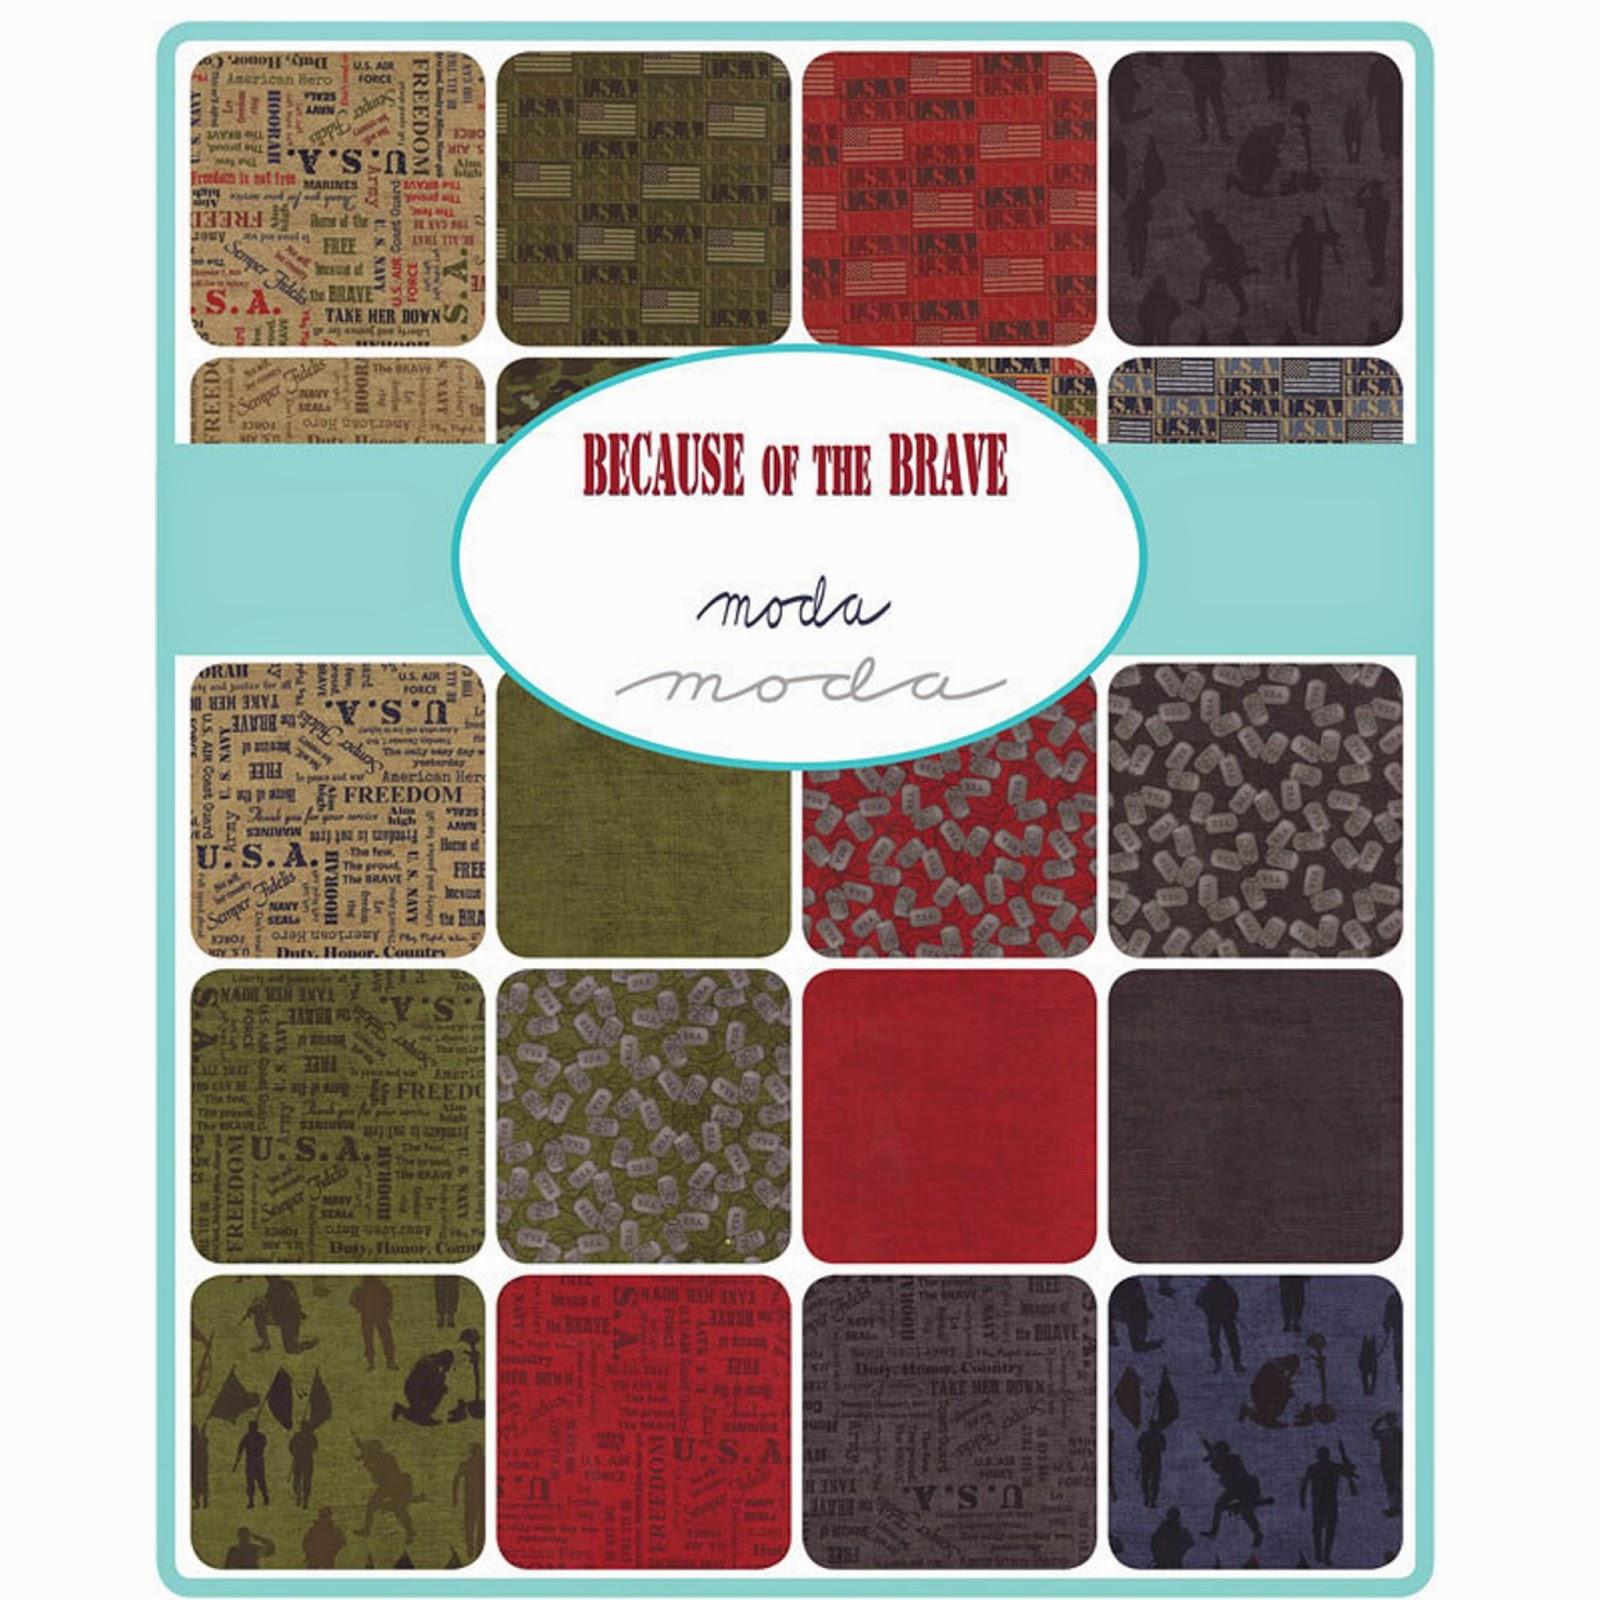 Moda BECAUSE OF THE BRAVE Fabric by Moda Fabrics